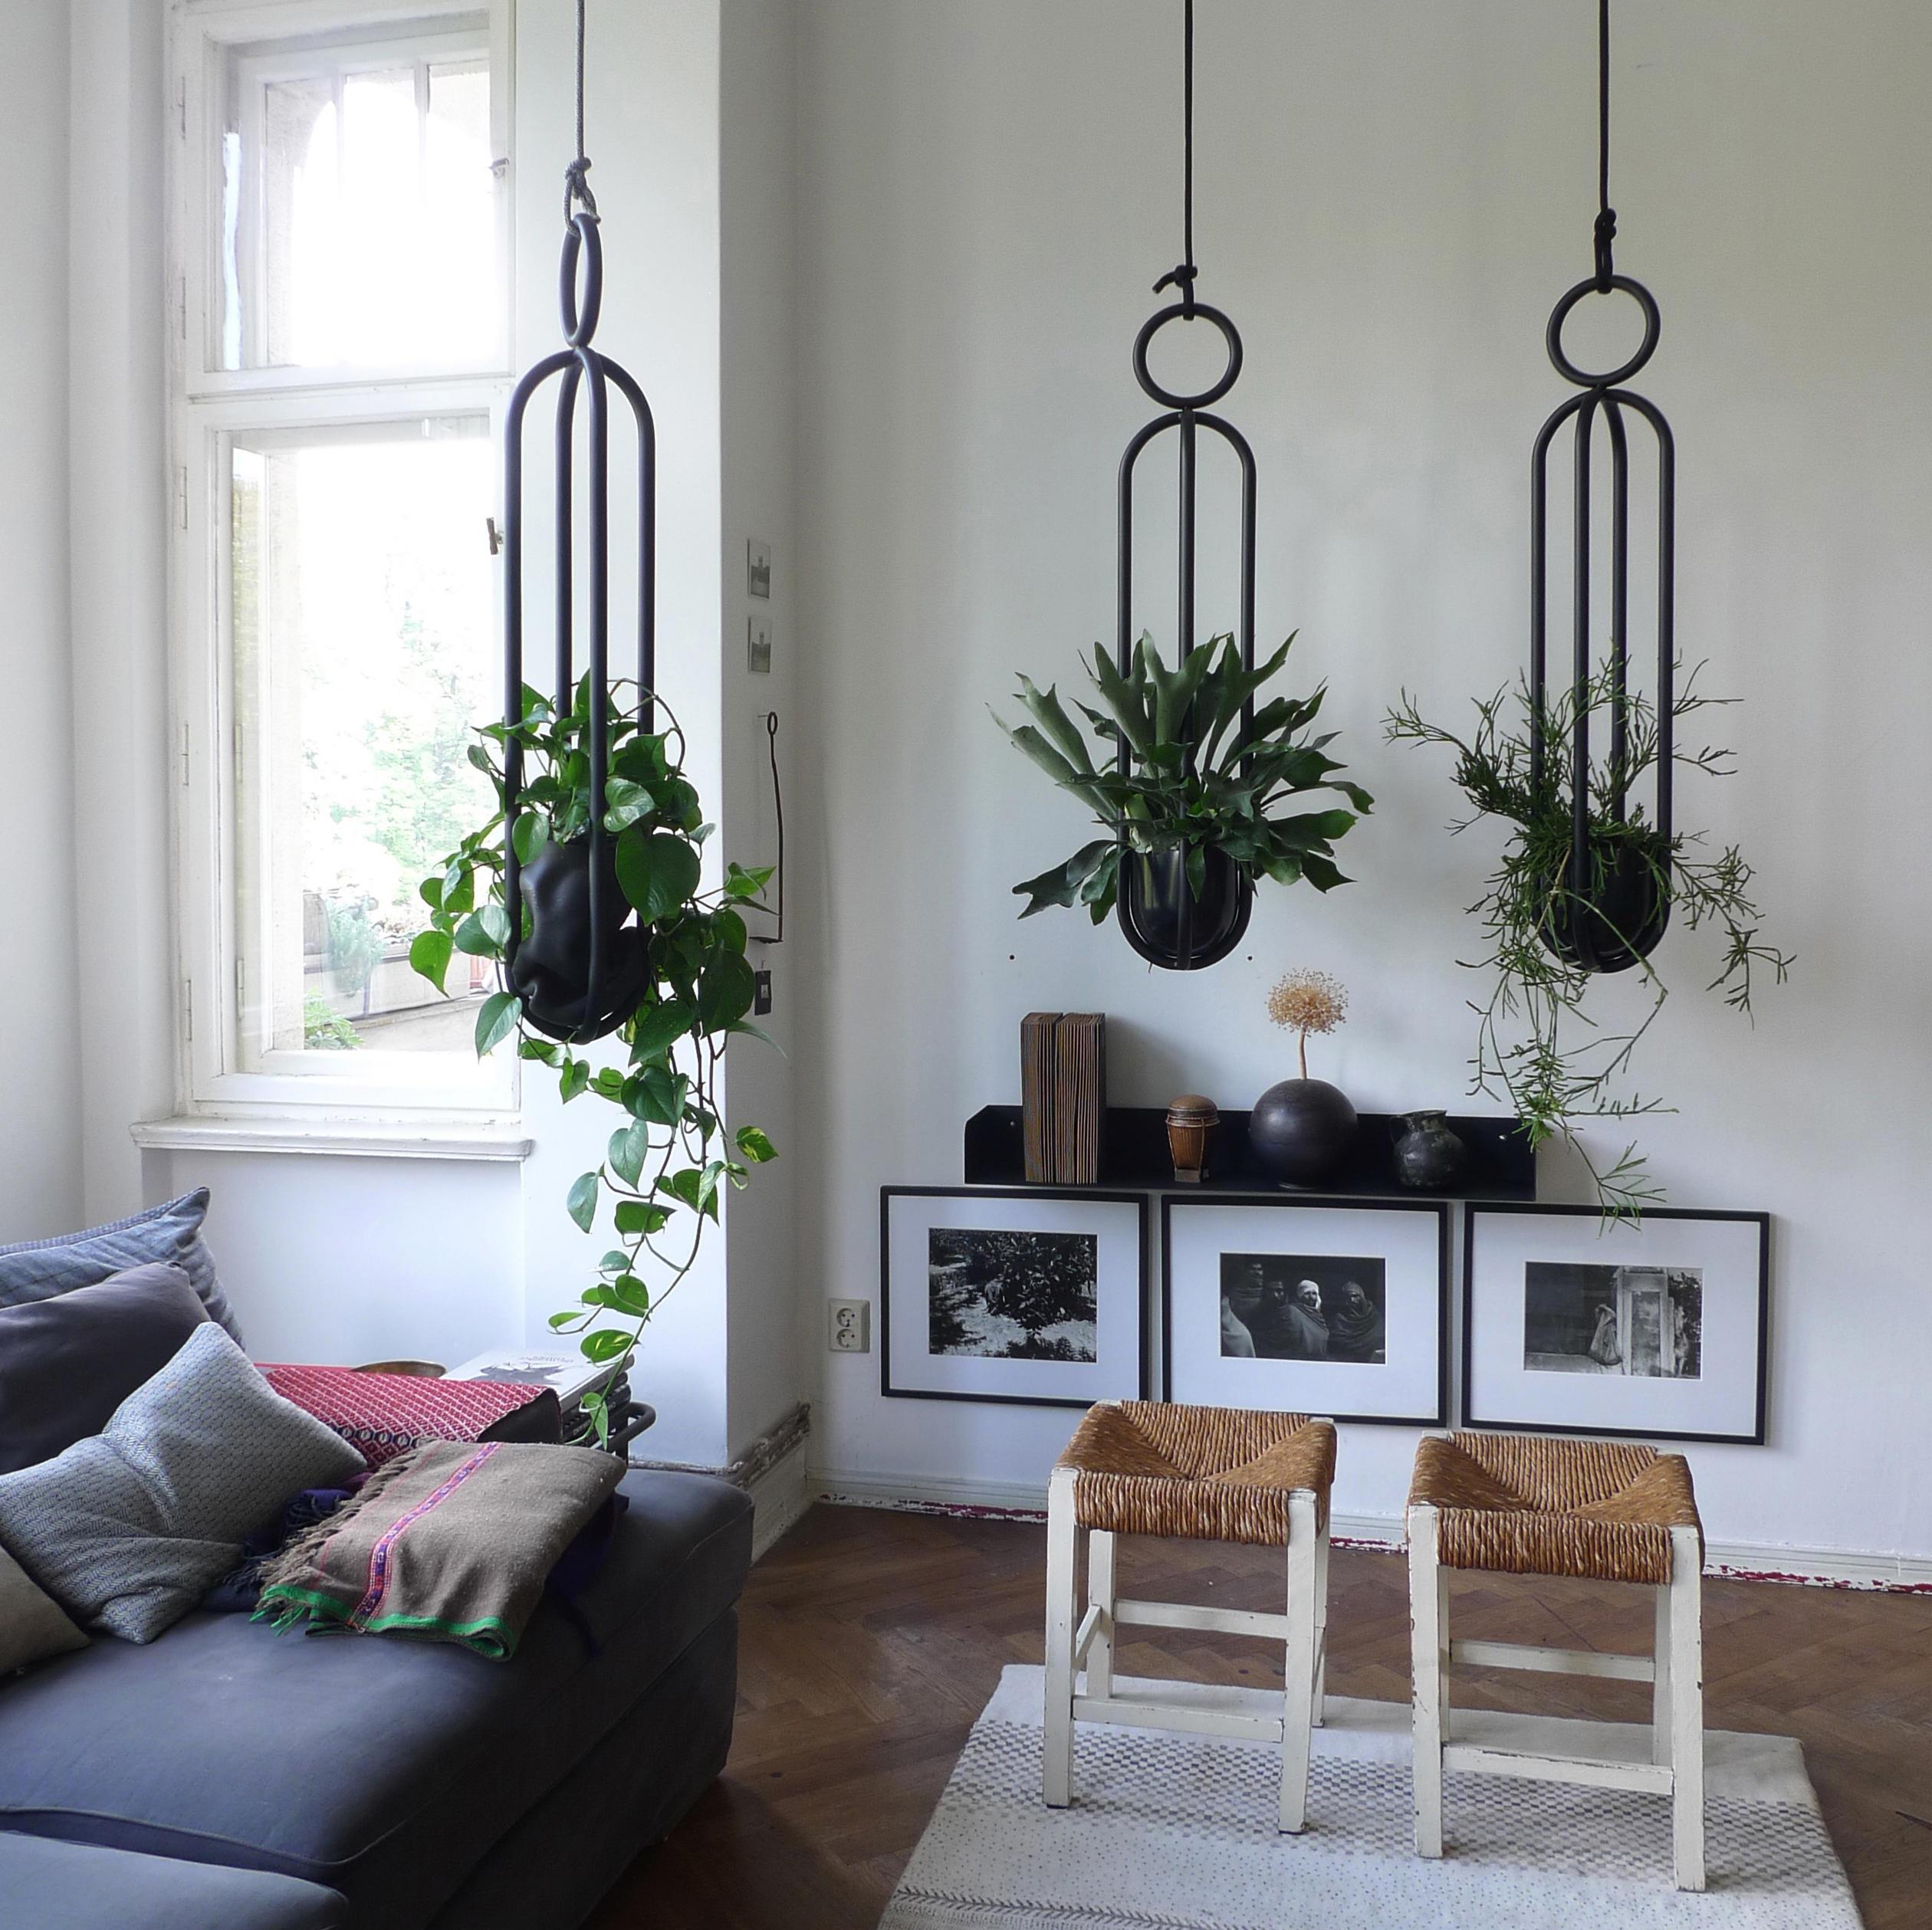 Blumenampel Edition hanging room object  Architonic